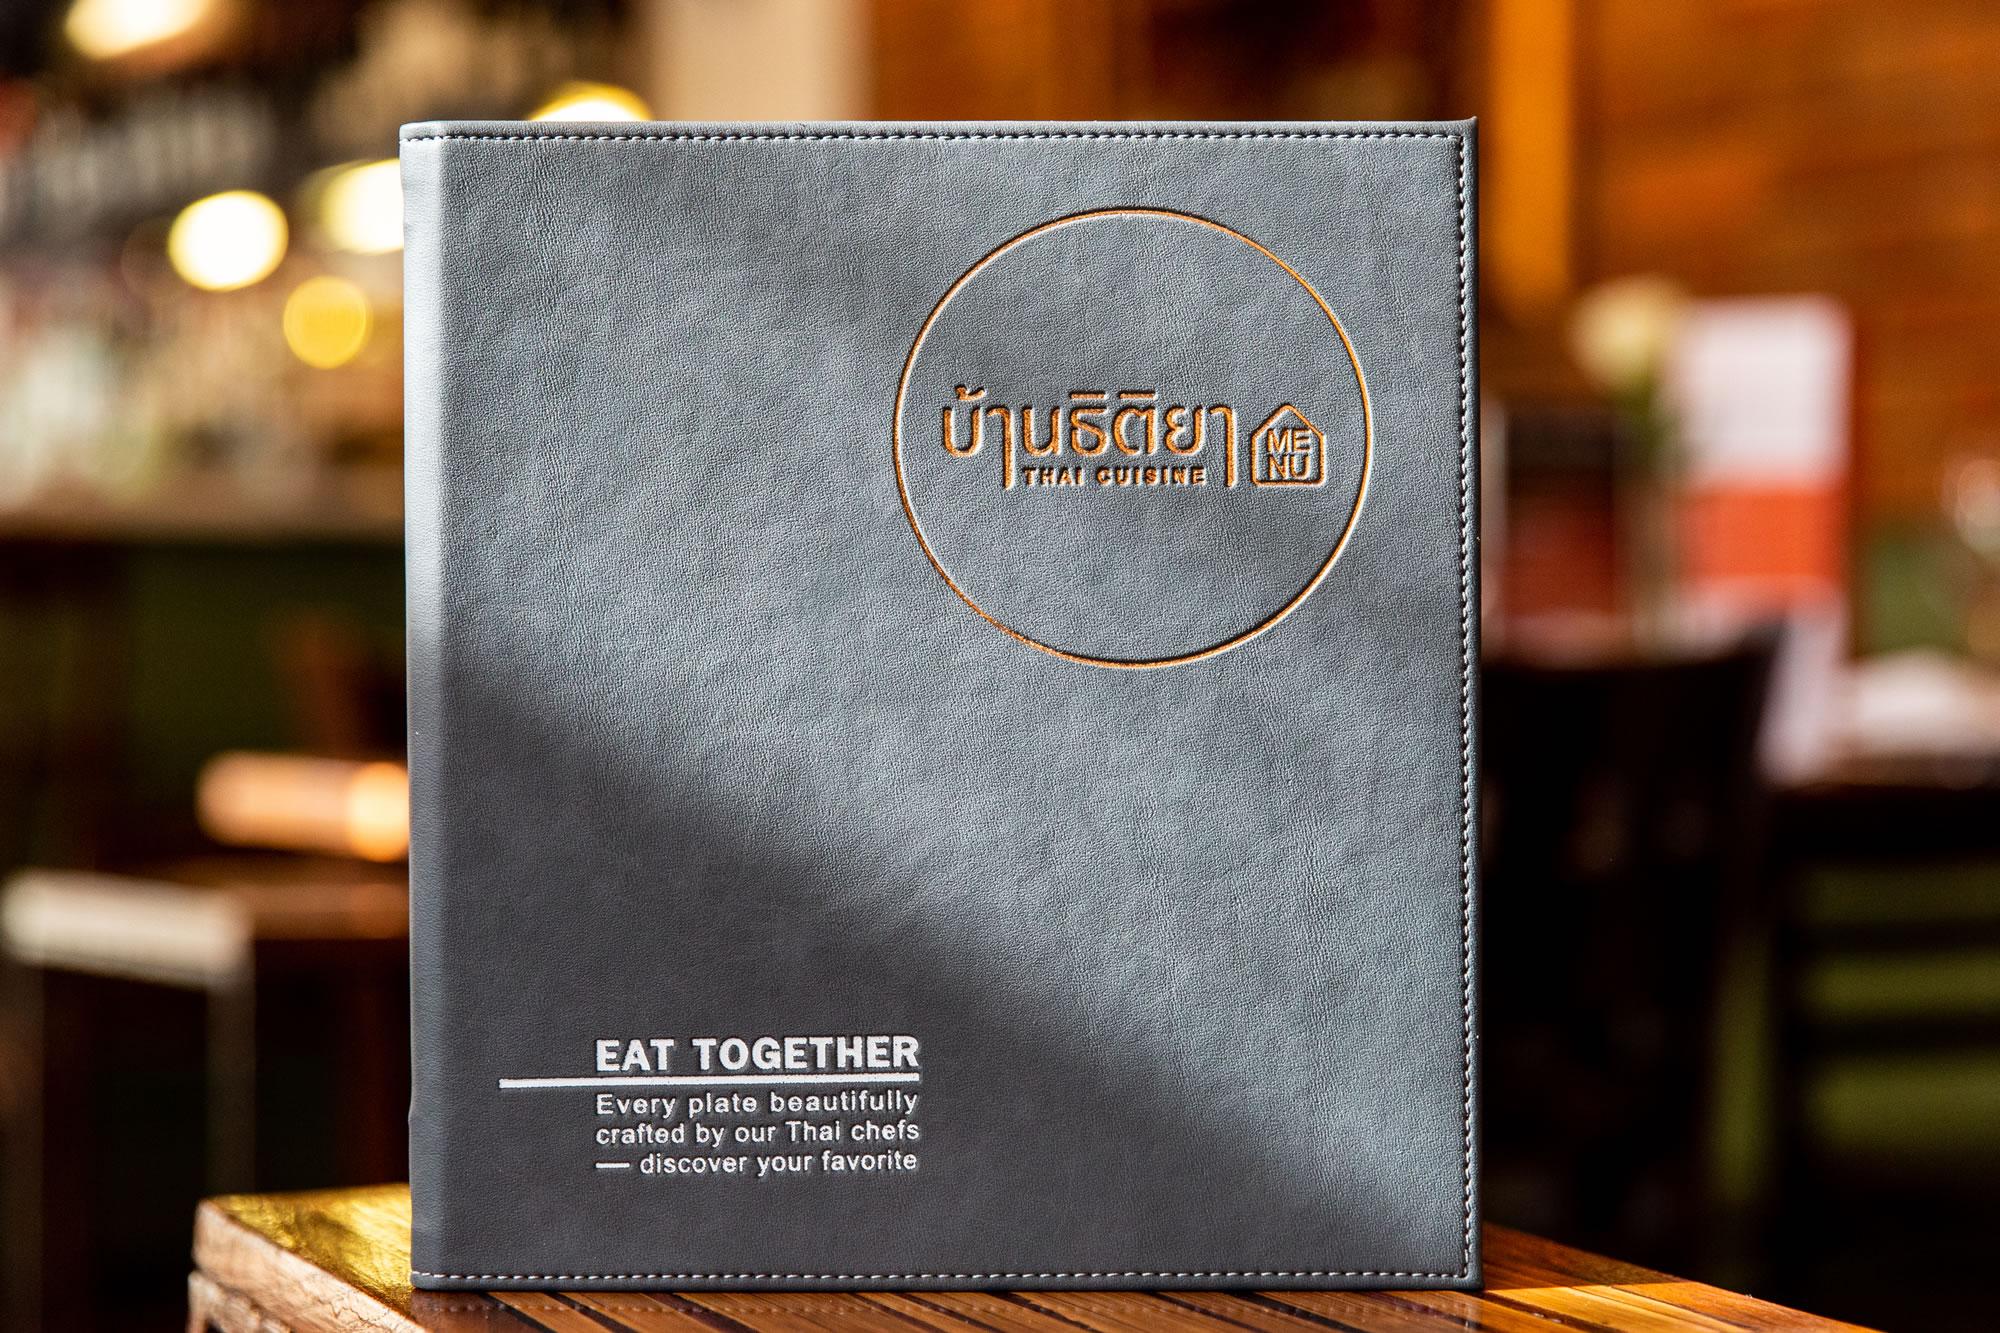 Baan_Thitiya_Thai_Restaurant_Bishops_Stortford-19.jpg